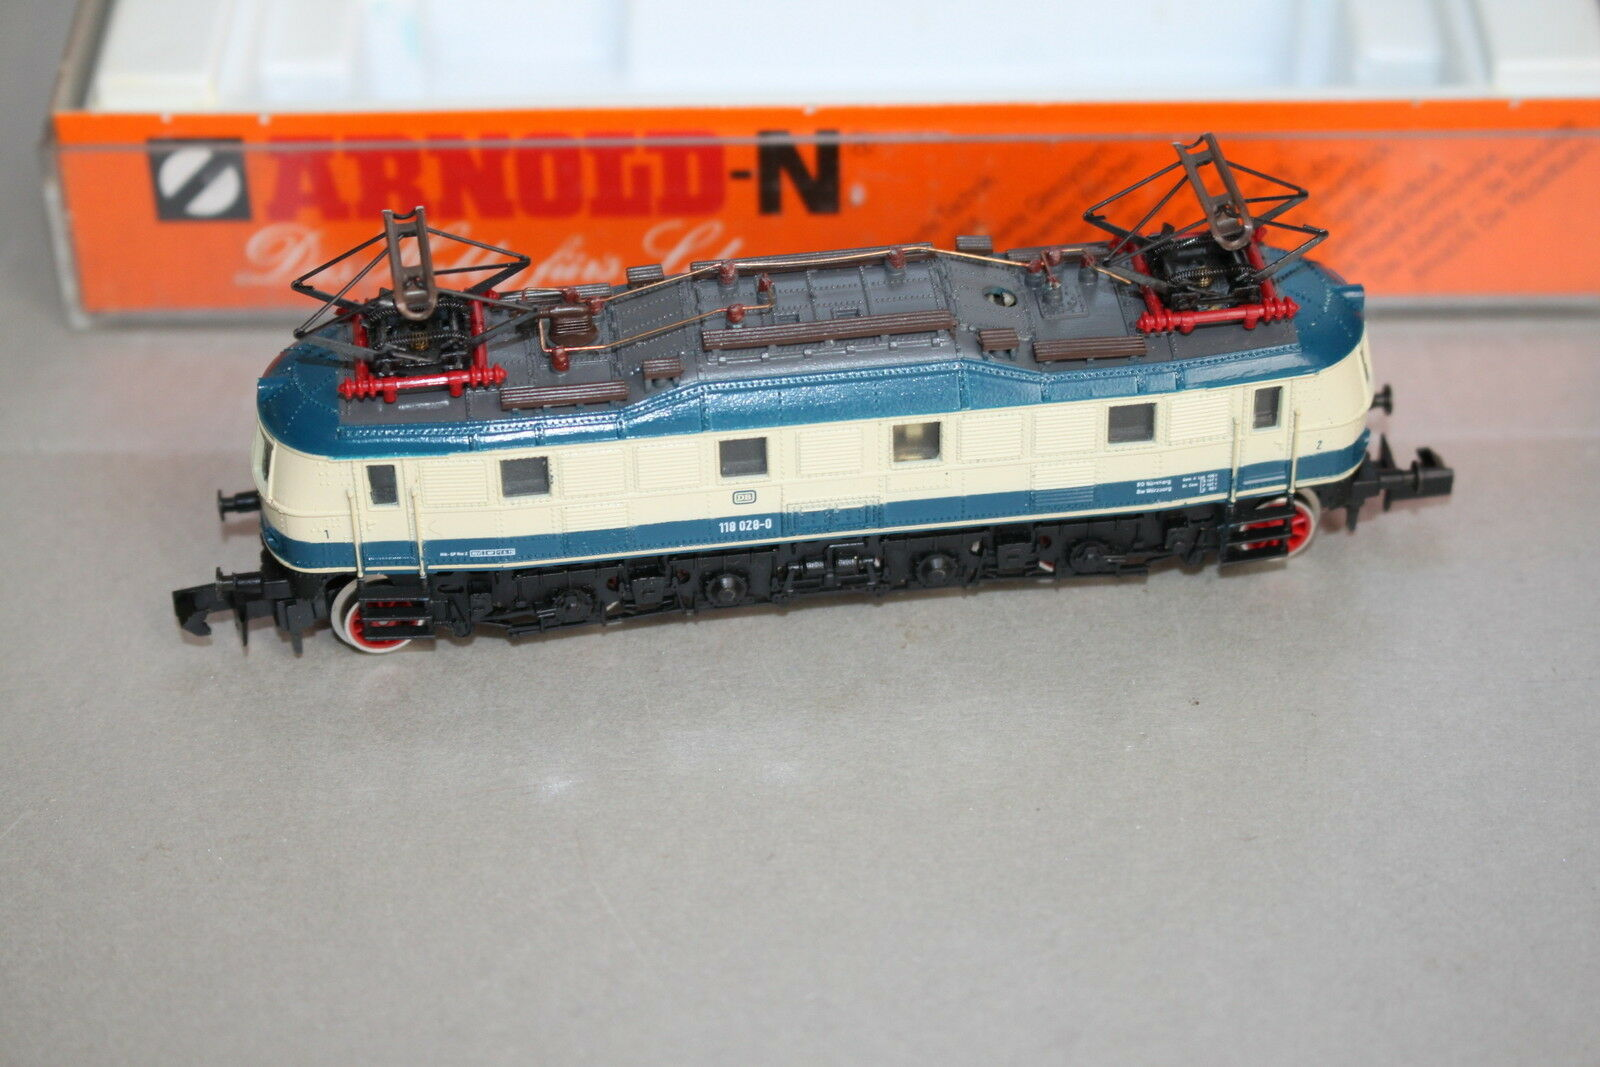 Arnold 2459 Locomotora Eléctrica Serie 118 028-8 DB Azul Beige Escala N Ovp